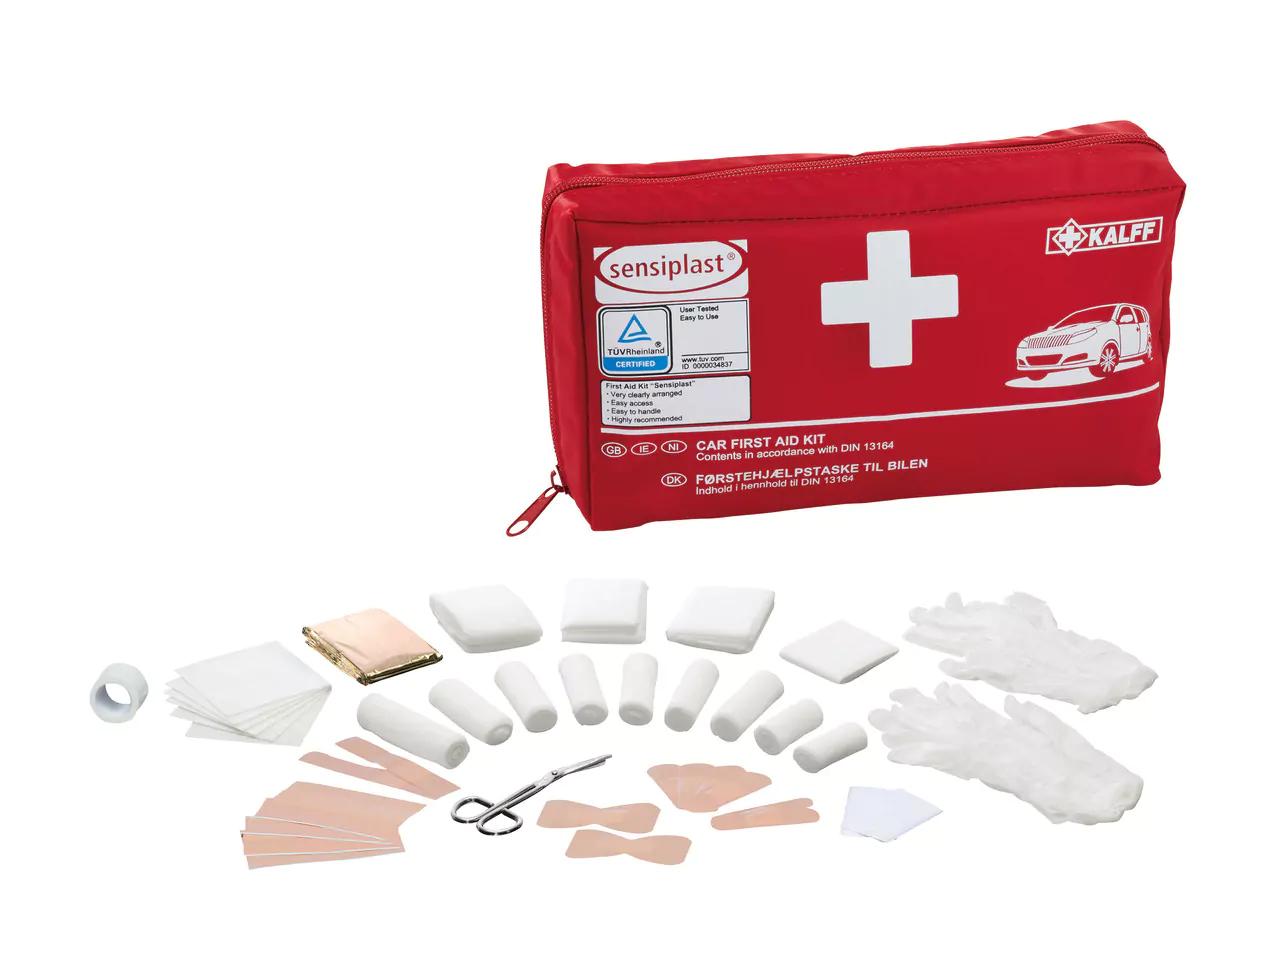 Sensiplast Car First Aid Kit - £4.99 LIDL